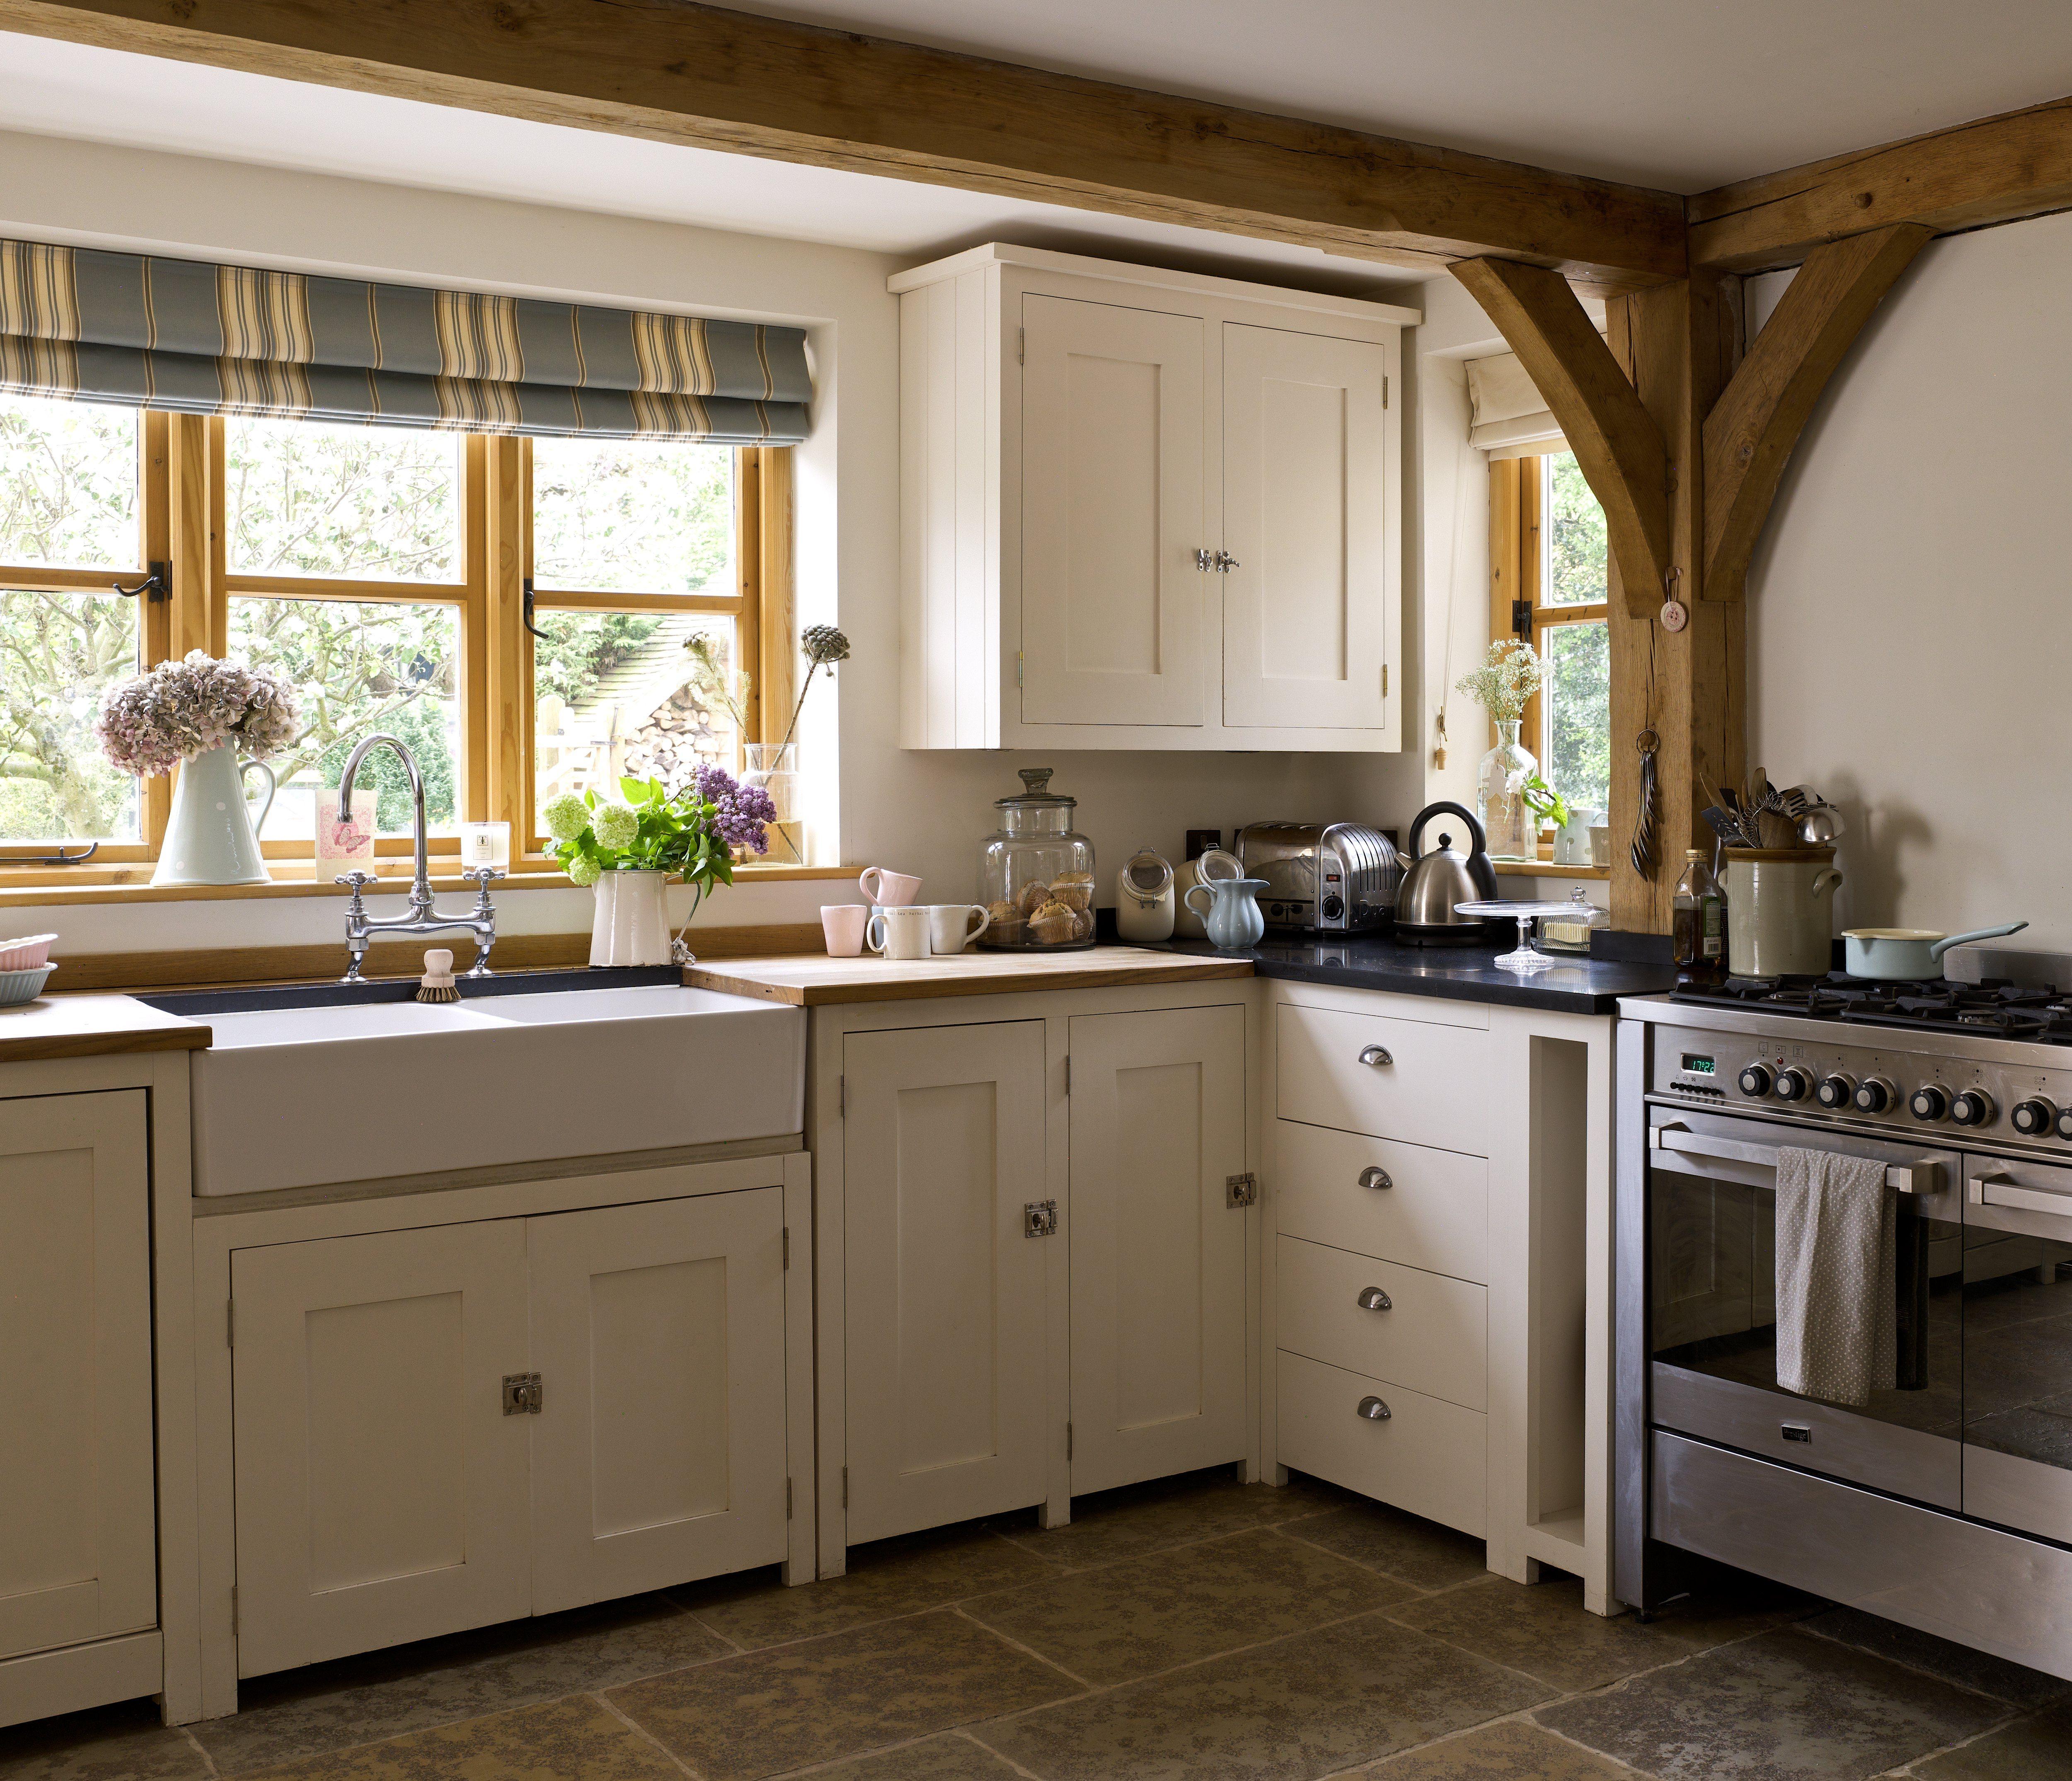 Pin By Laura On Border Oak Case Study Ryelands Kitchen Design Condo Kitchen Oak Frame House